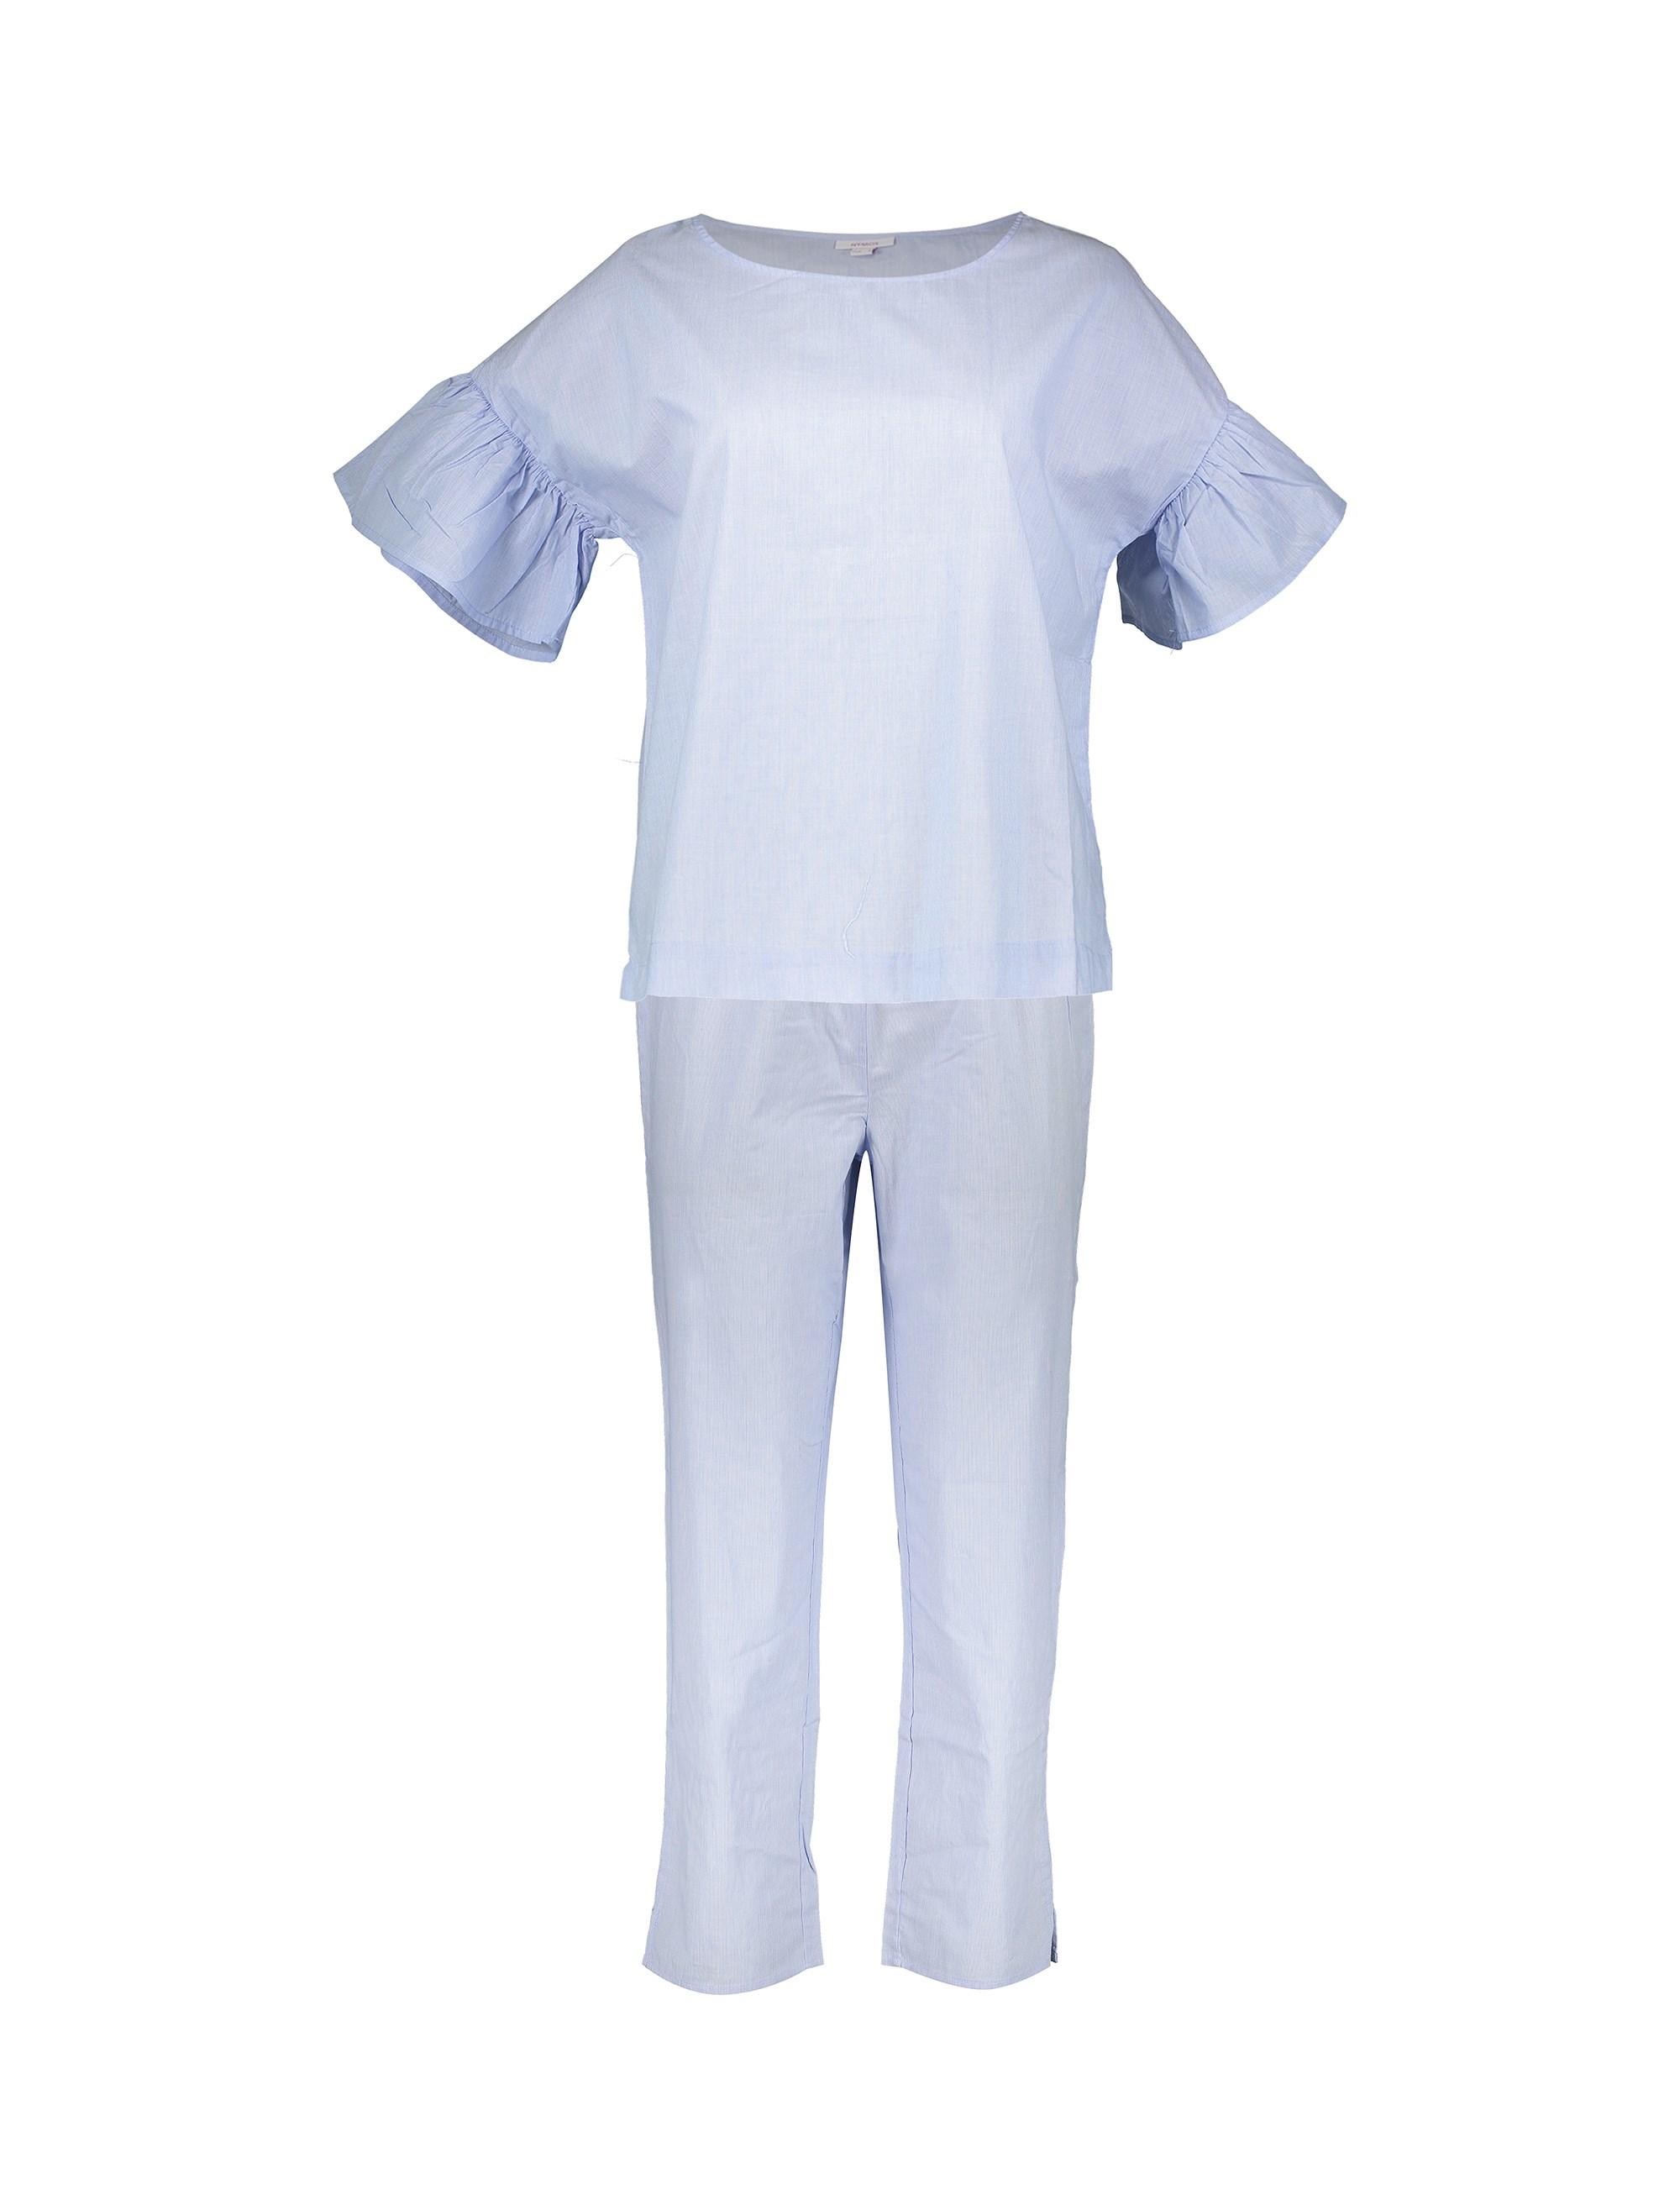 تی شرت و شلوار نخی زنانه - یوپیم              👗